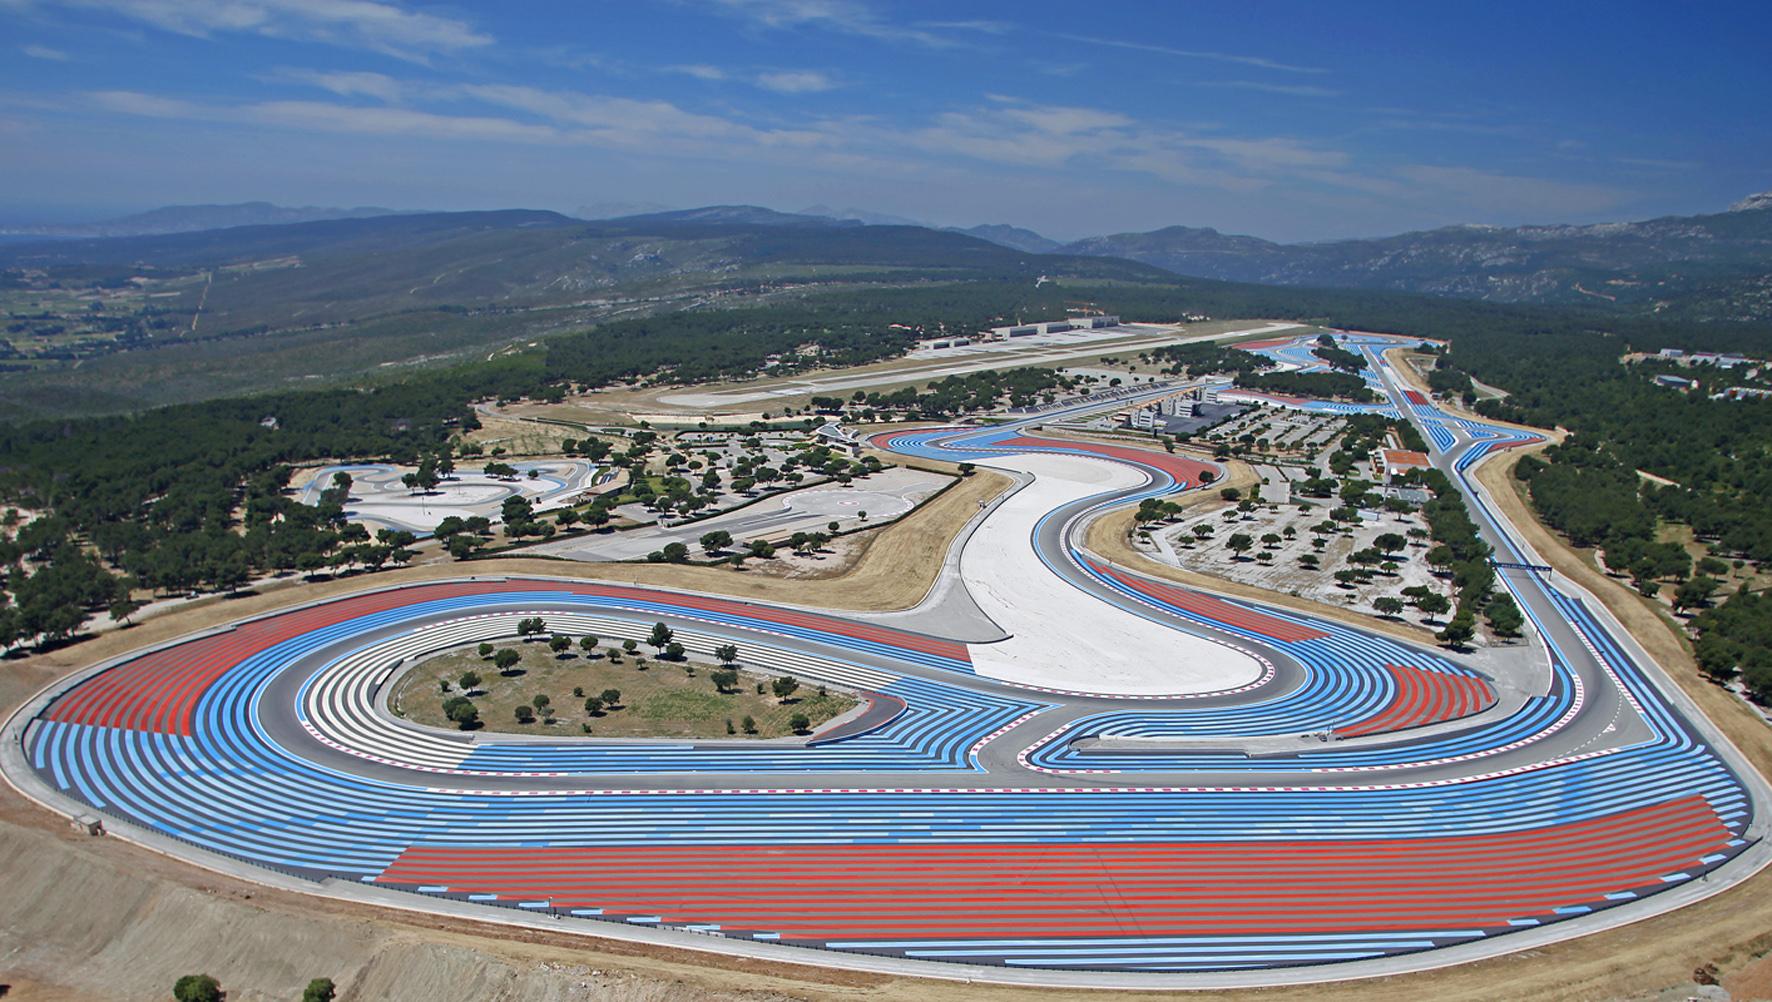 Paul Ricard Test Track